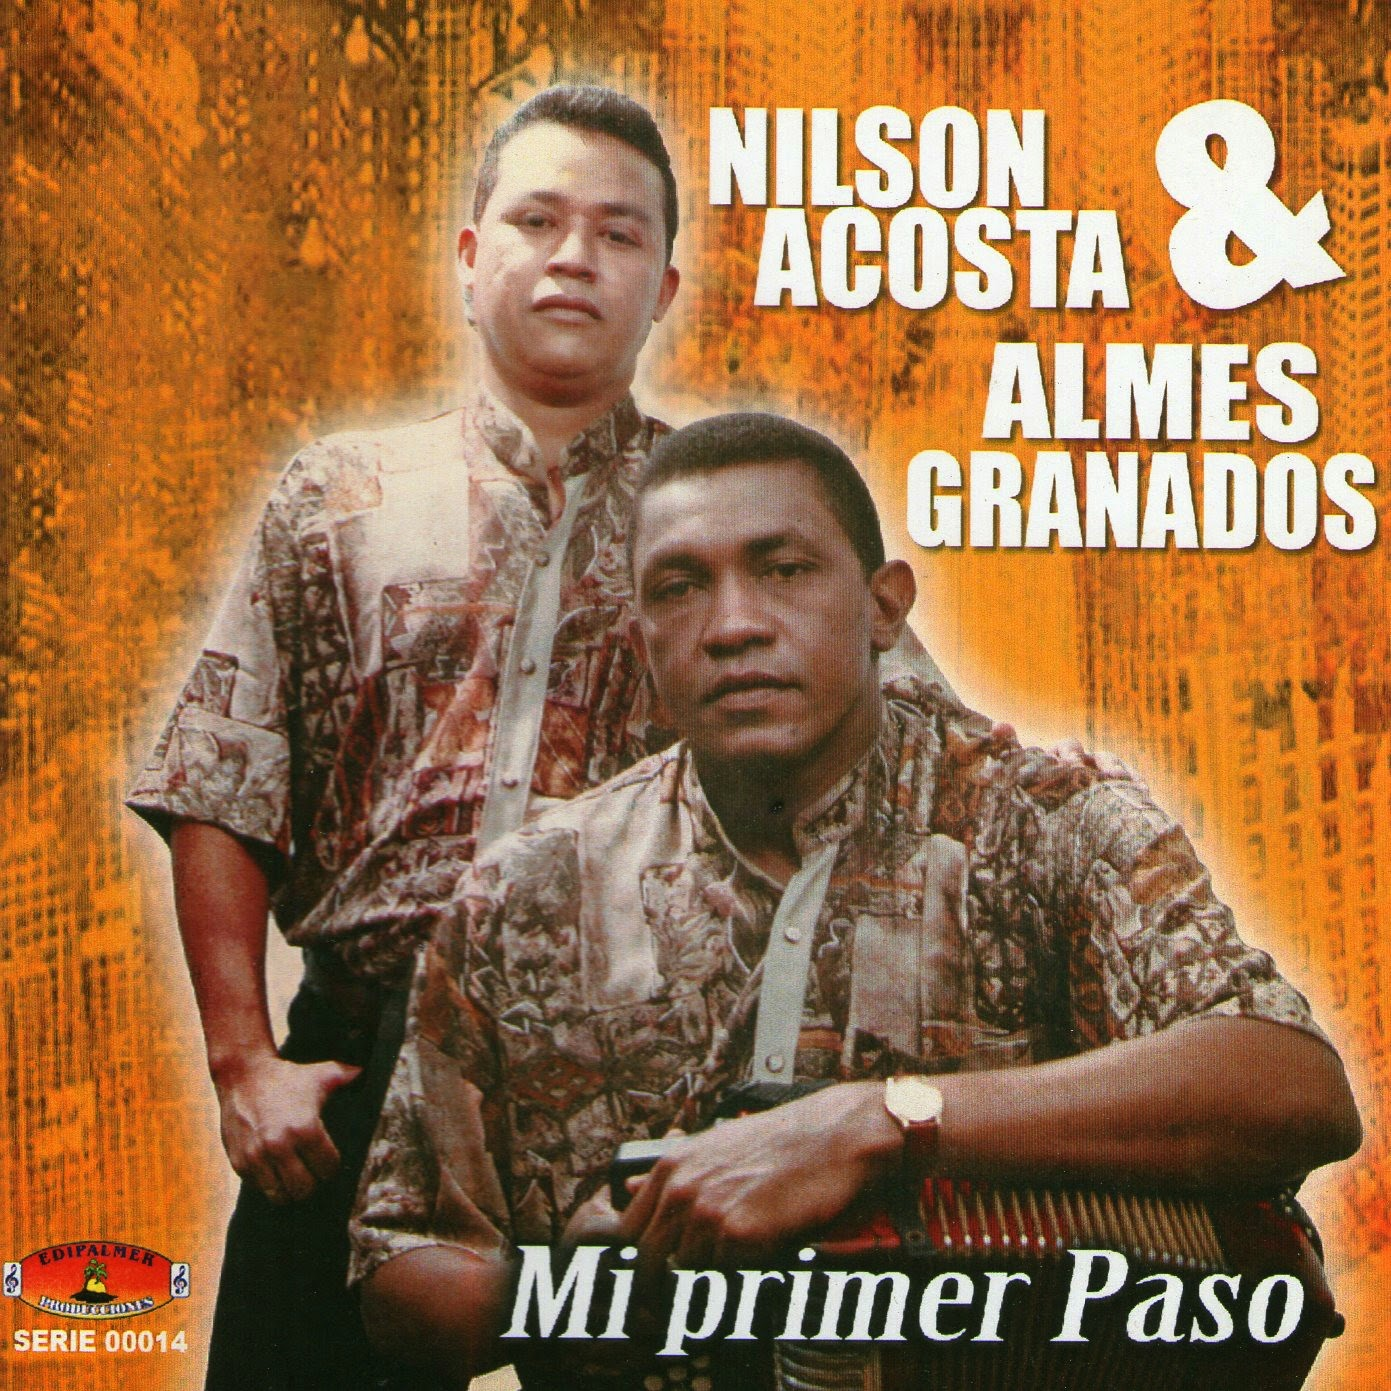 Nilson Acosta